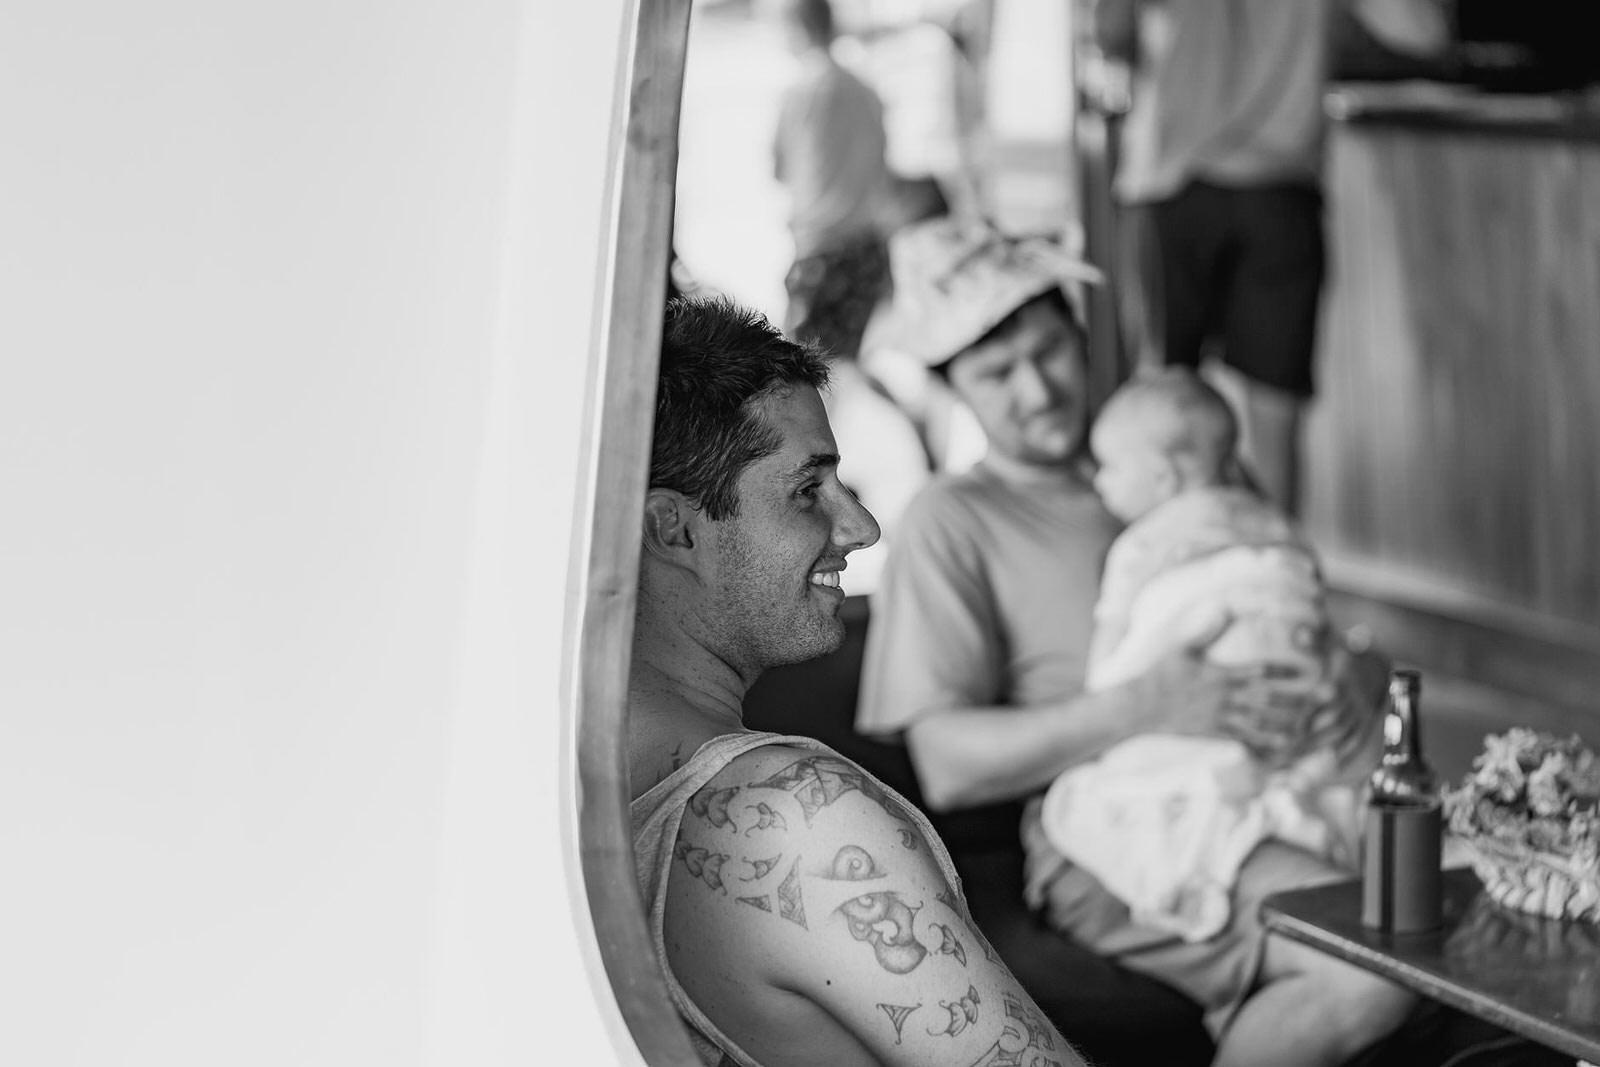 newfound-hai-tide-nusa-lembongan-bali-wedding-photographers-031